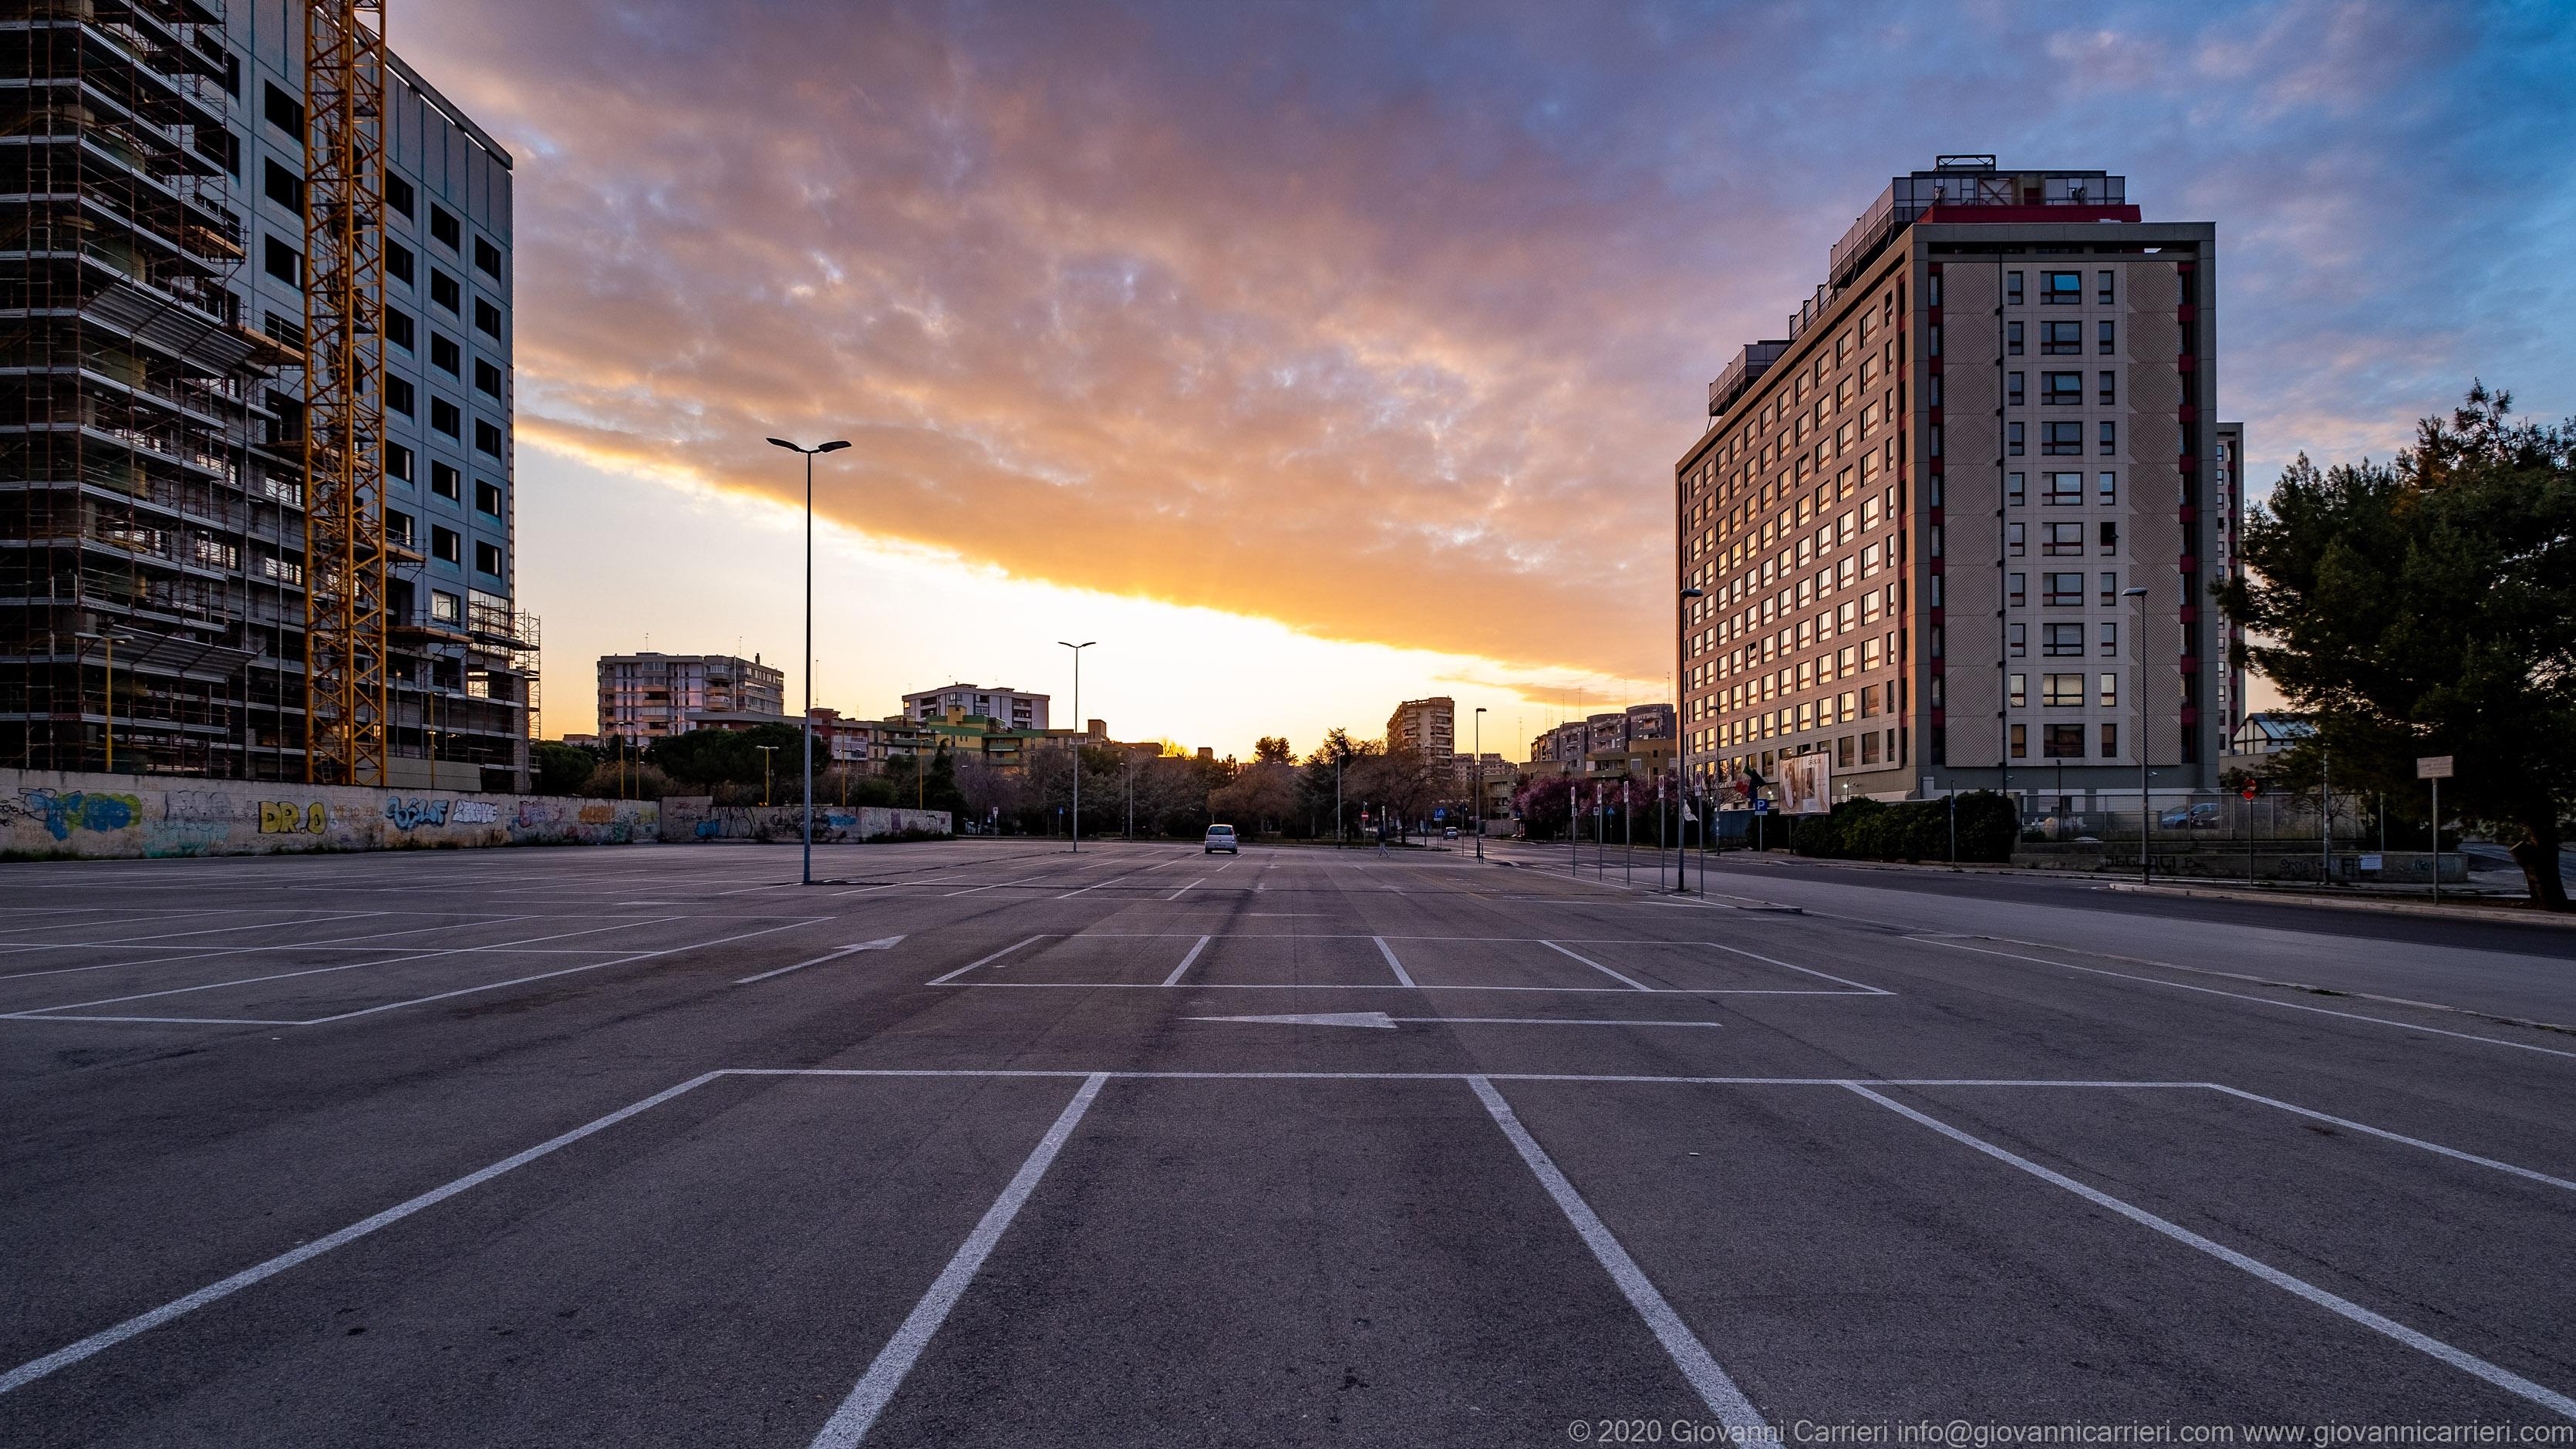 Viale Saverio Diogardi, Bari